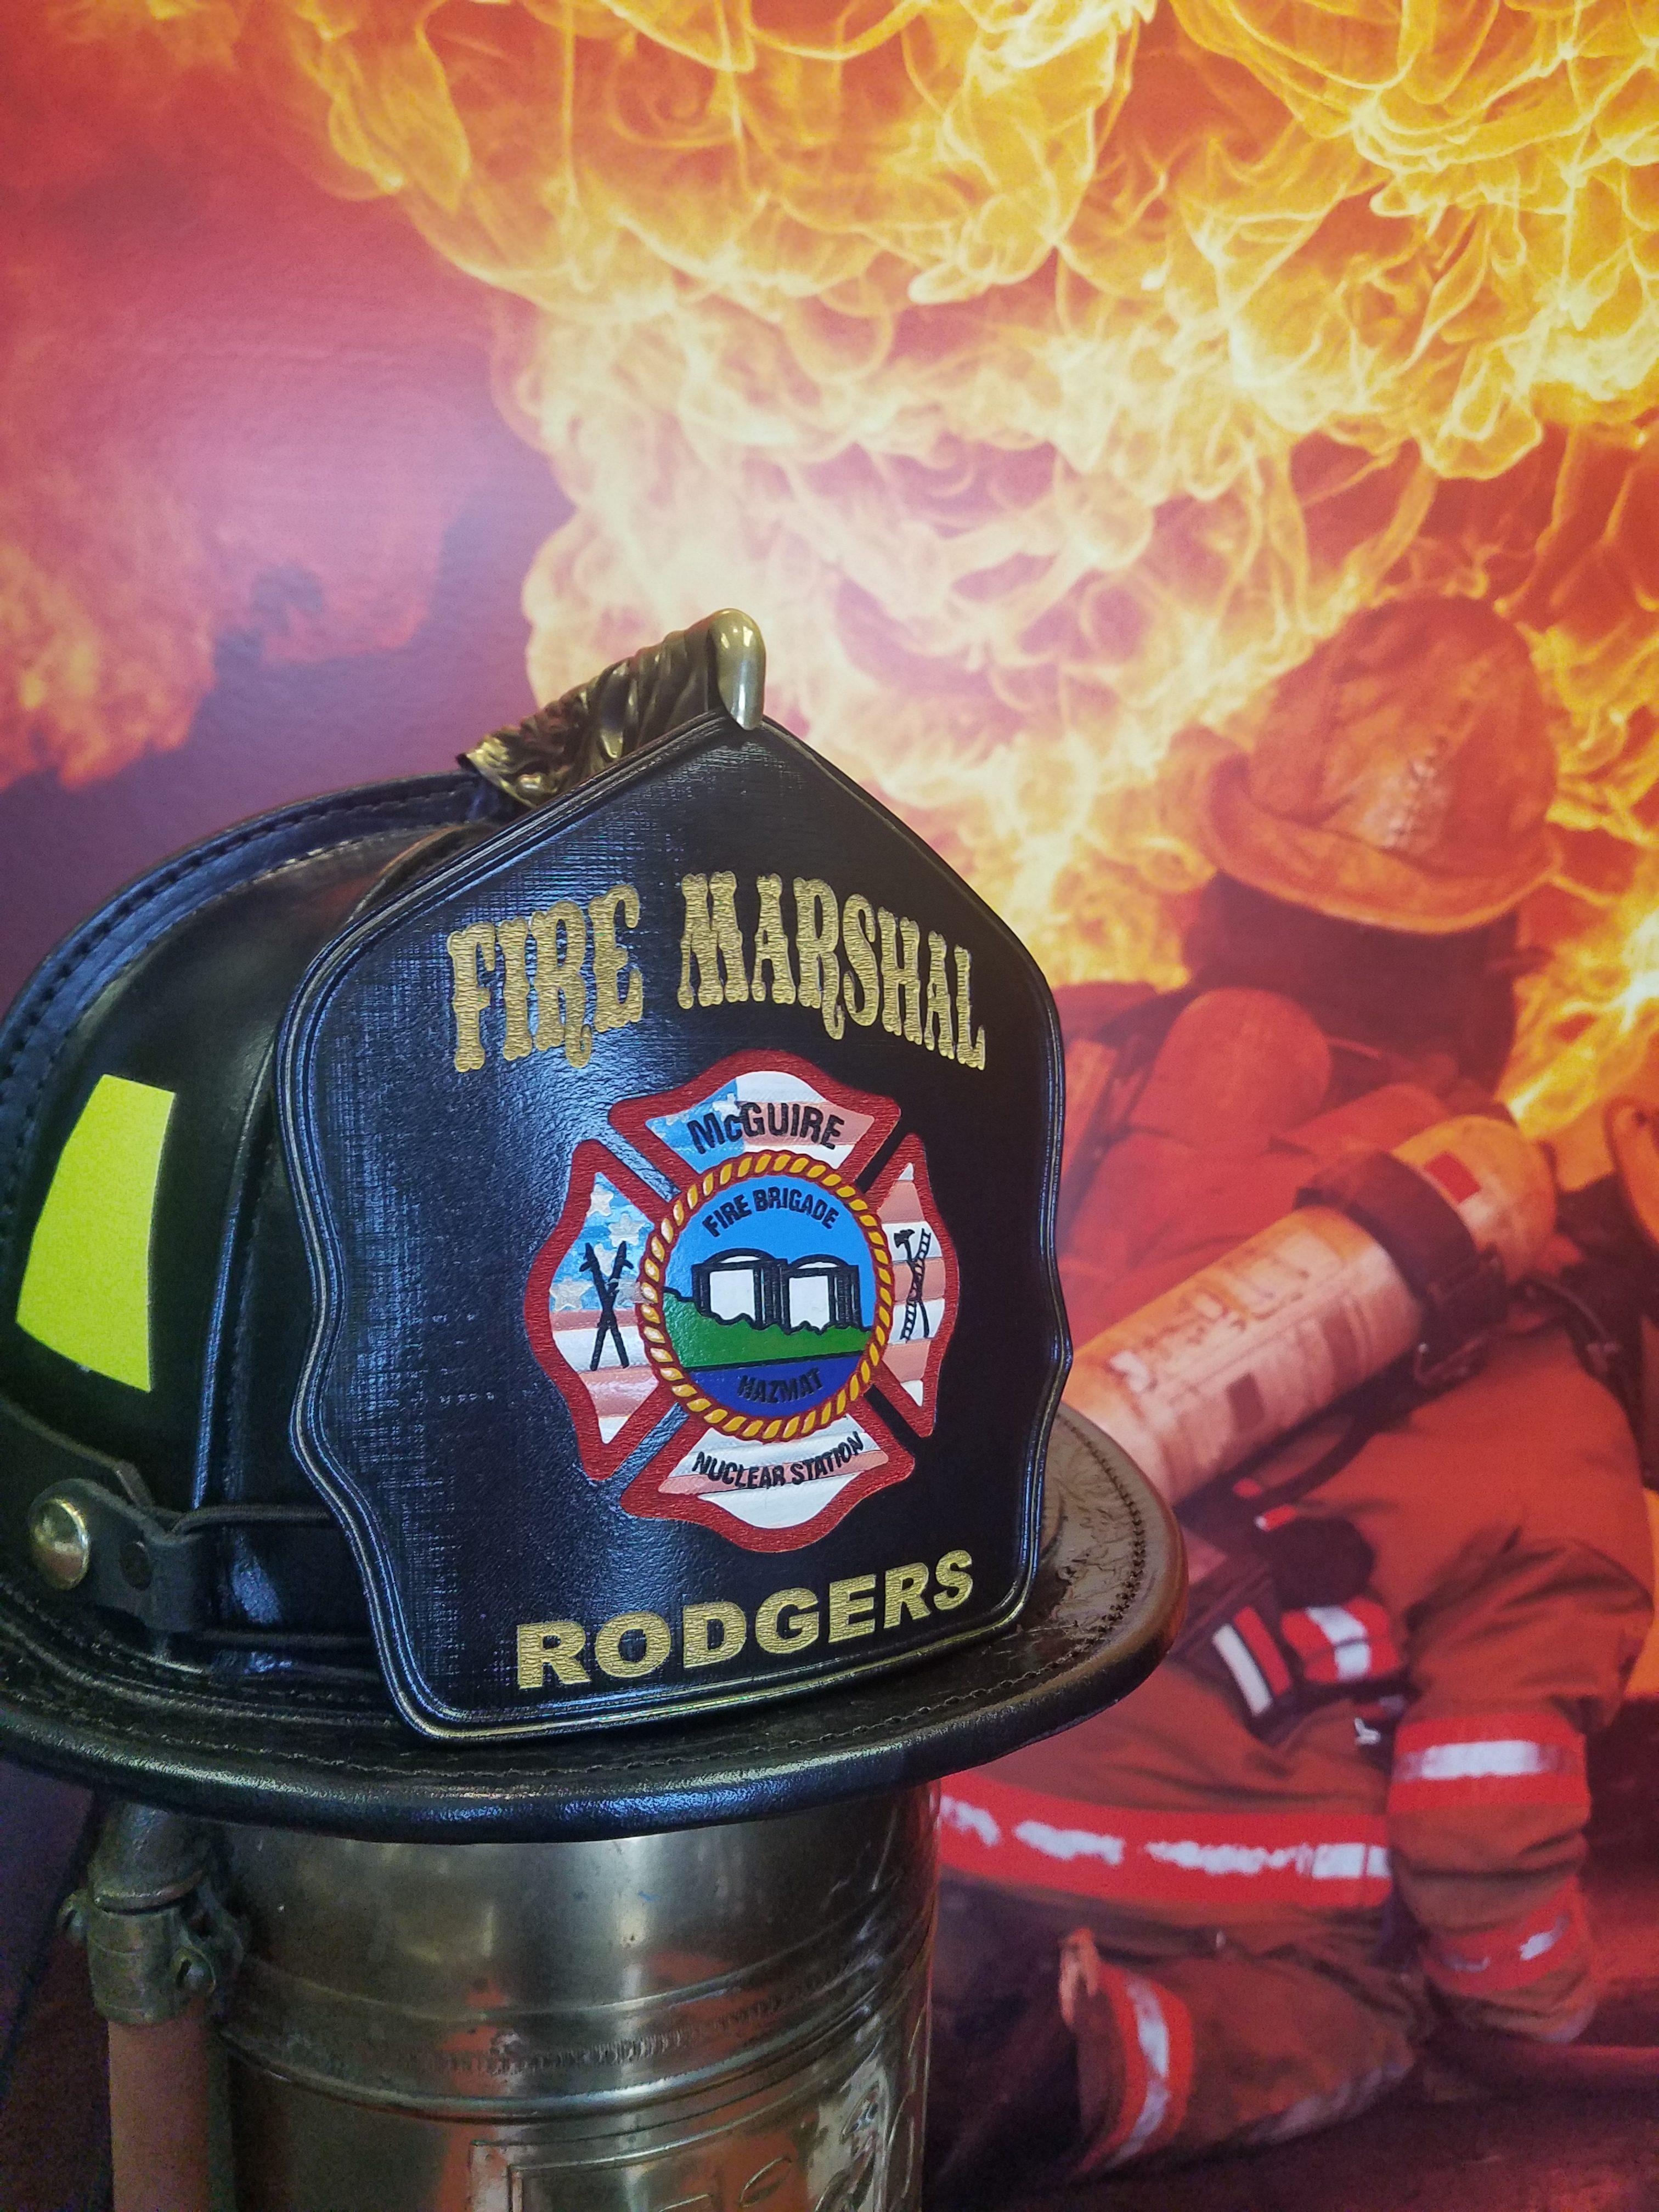 Fireline Shields Leather Firefighter Shields Radio